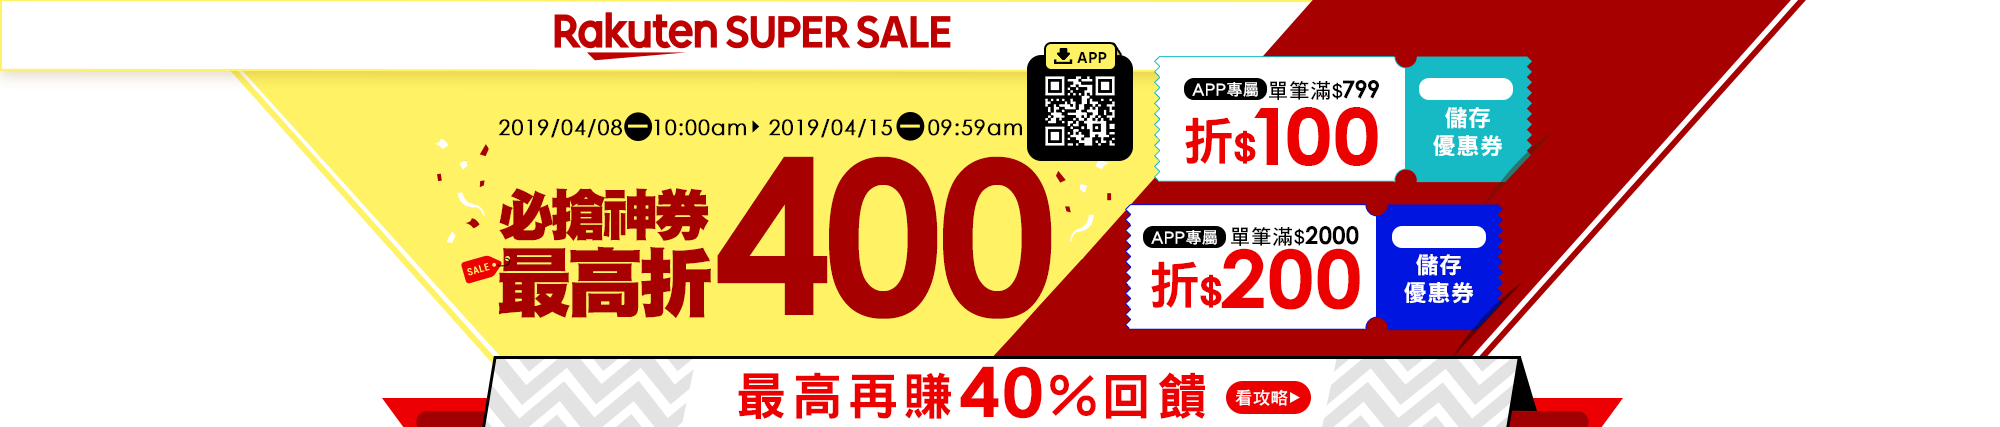 SUPER SALE超級特賣週:必搶神券最高折400,最高再賺40%點數回饋